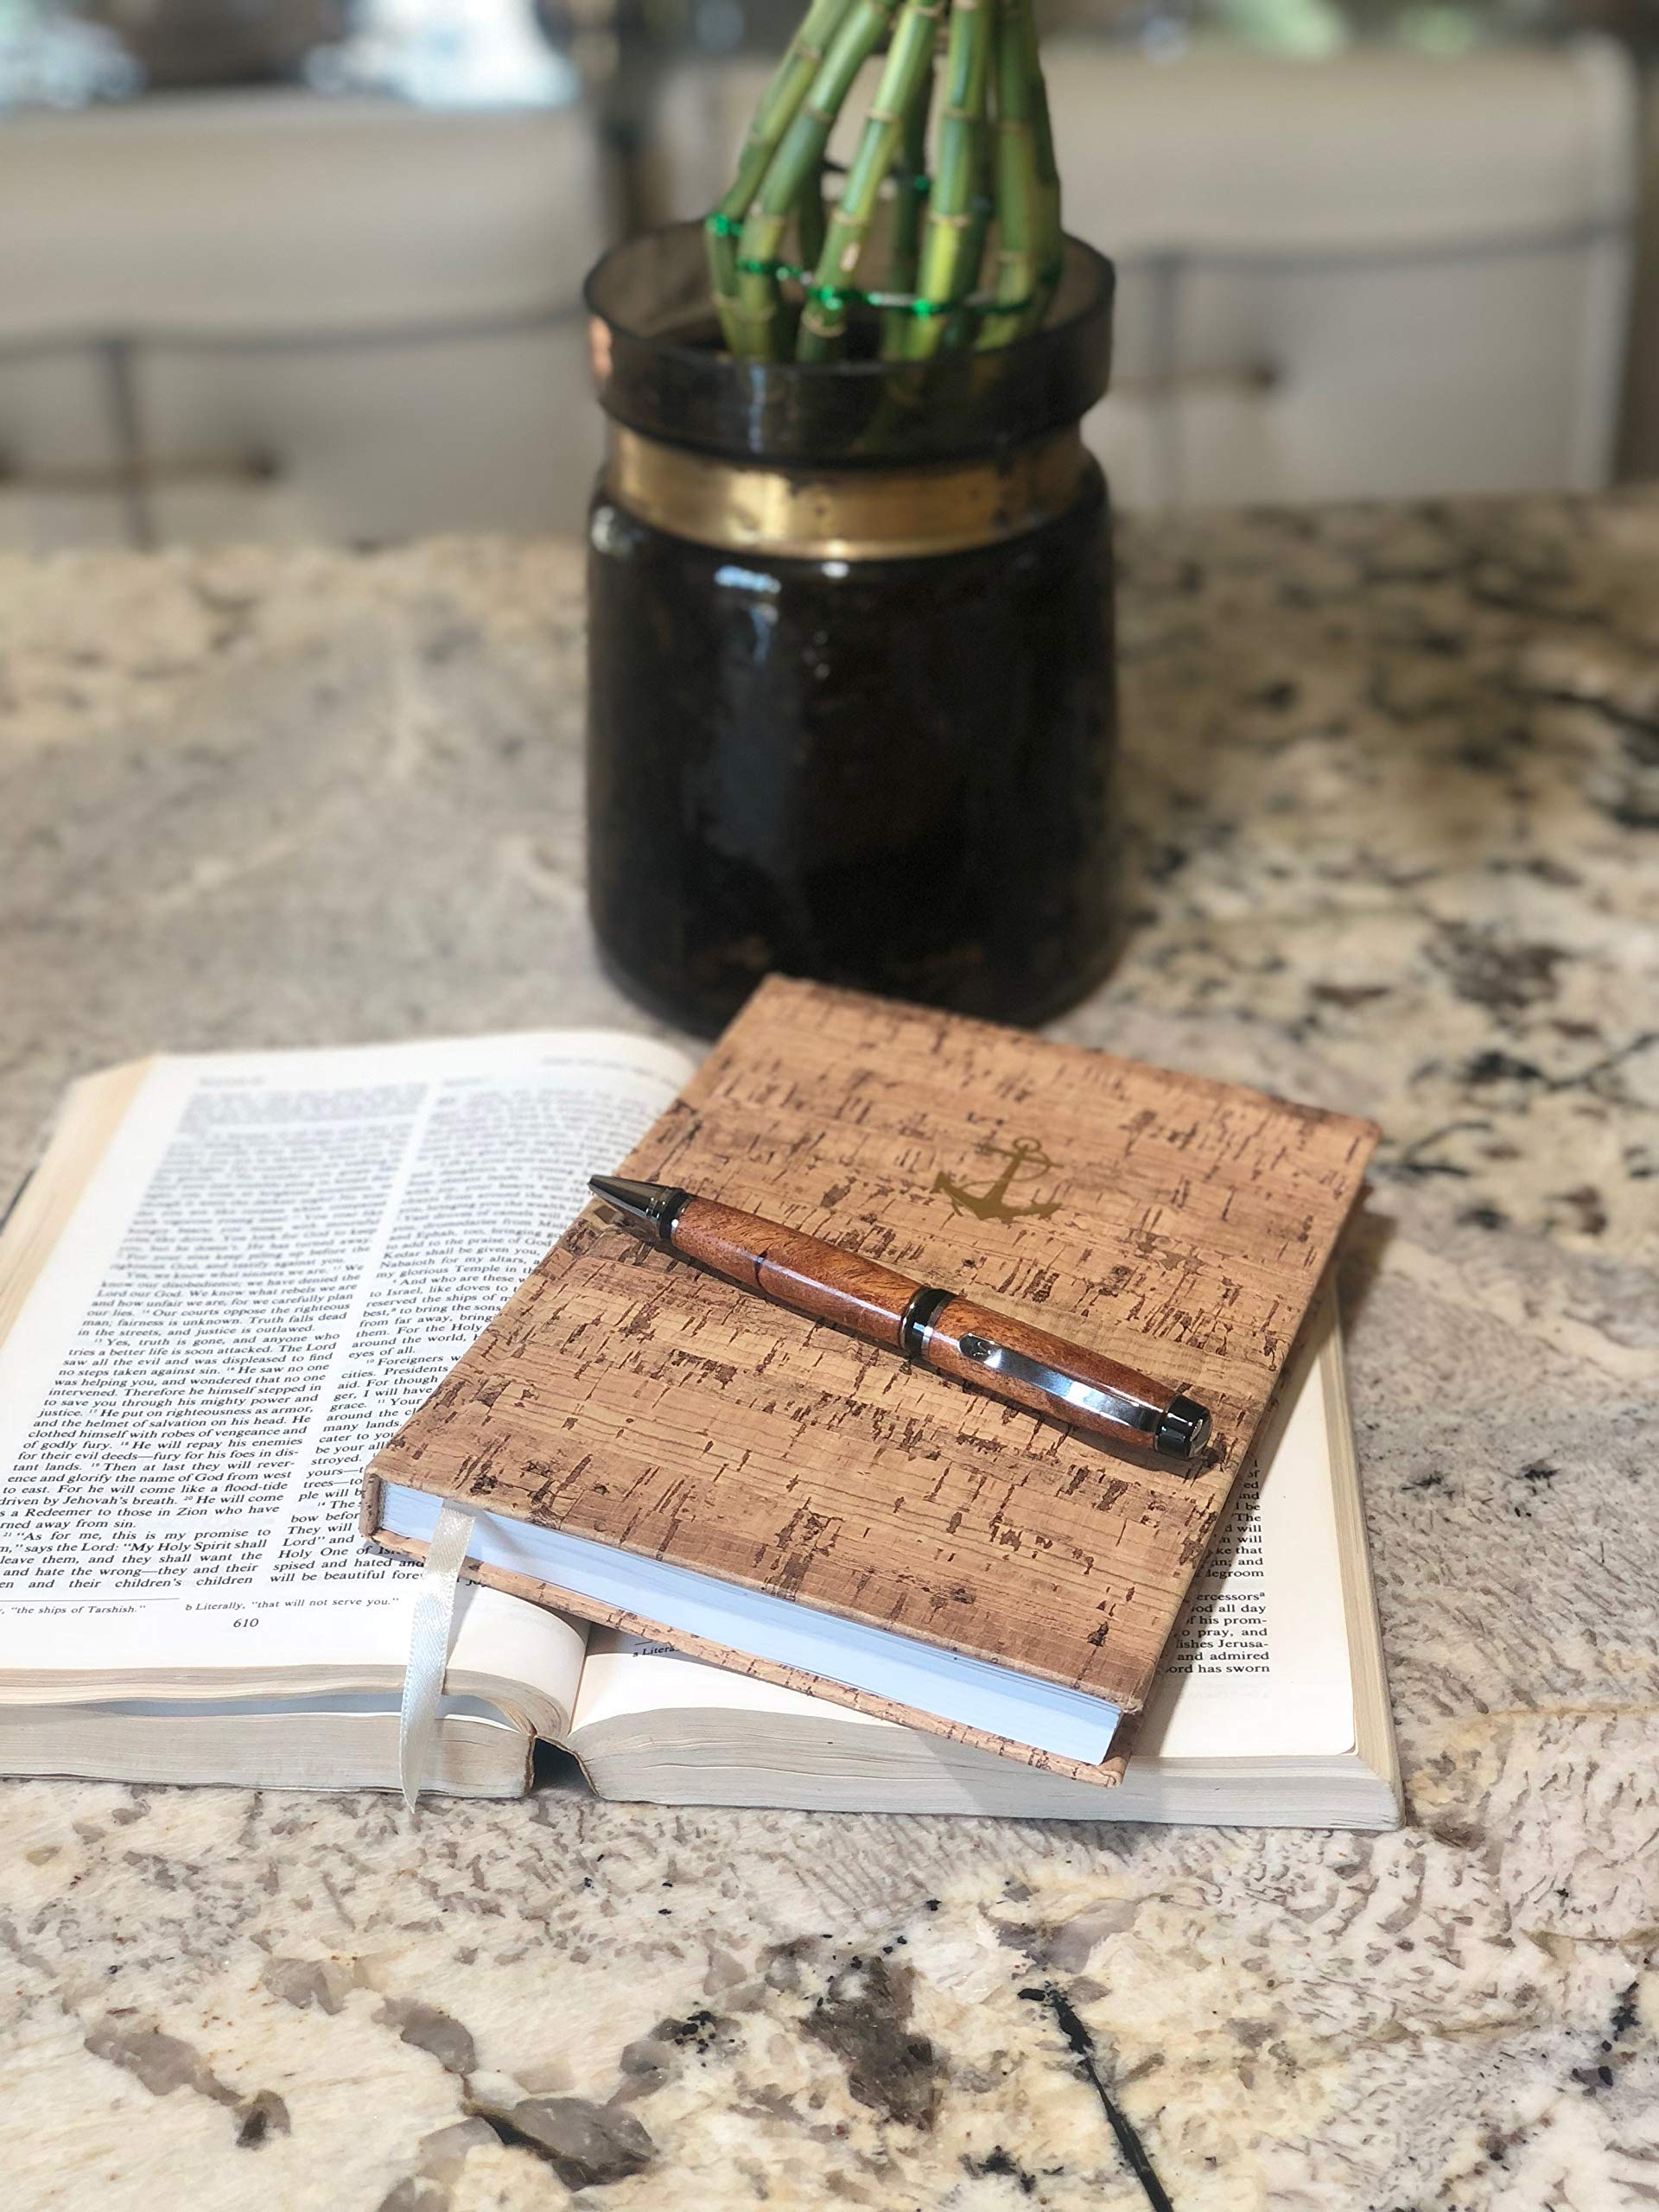 Bendecidos Pens Handmade Pens Texas Mesquite Wood, Black Titanium Plating by Bendecidos Pens (Image #8)